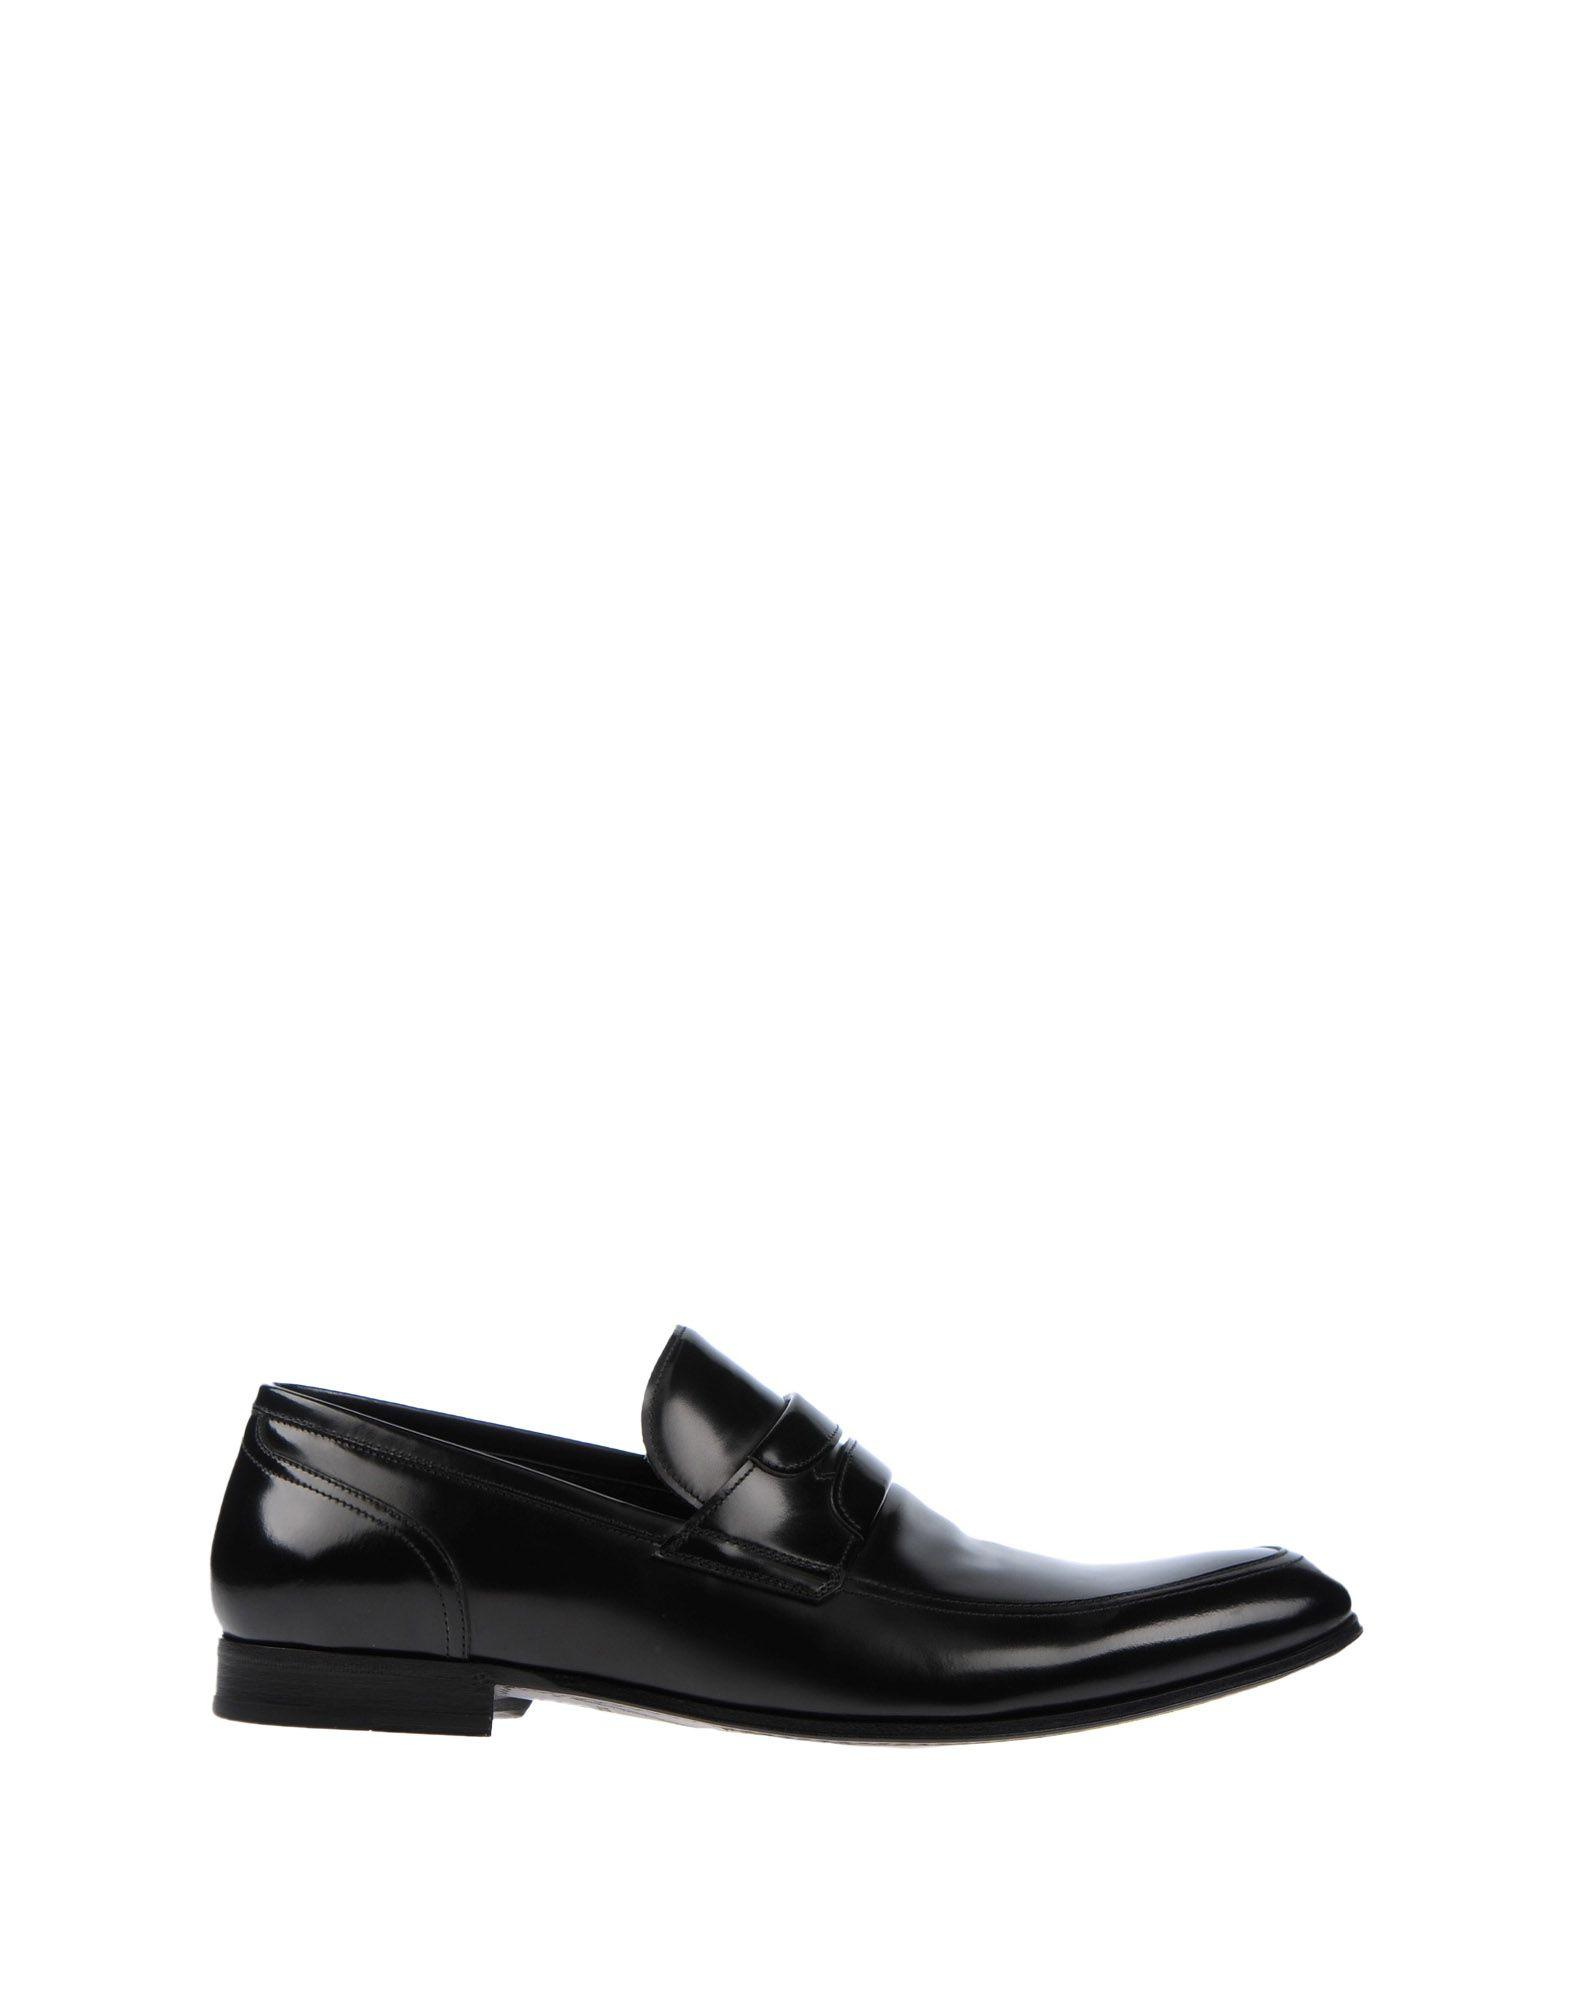 Dolce & Gabbana Loafers In Black